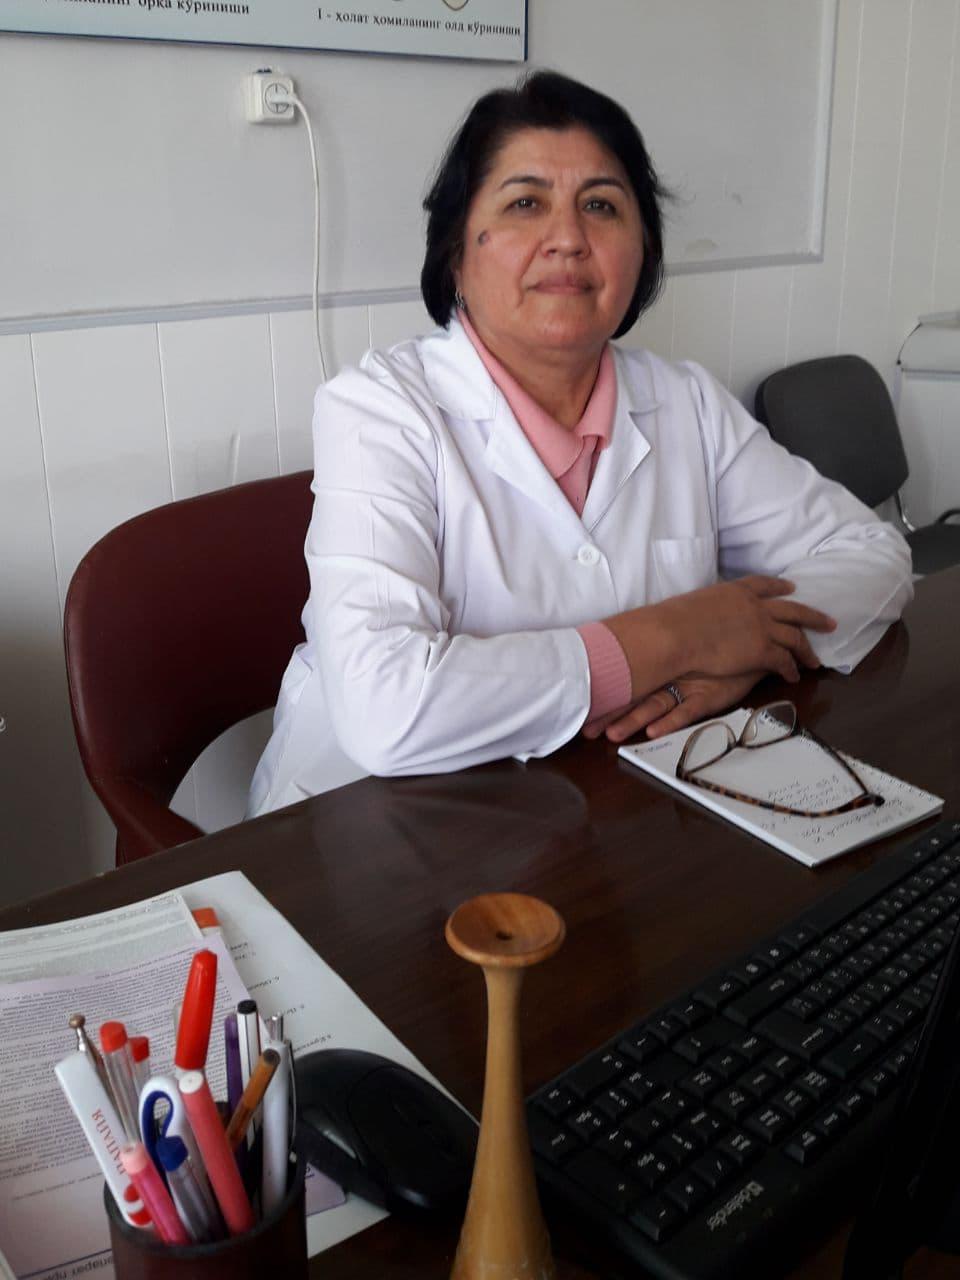 Атаходжаева Фатима гинеколог